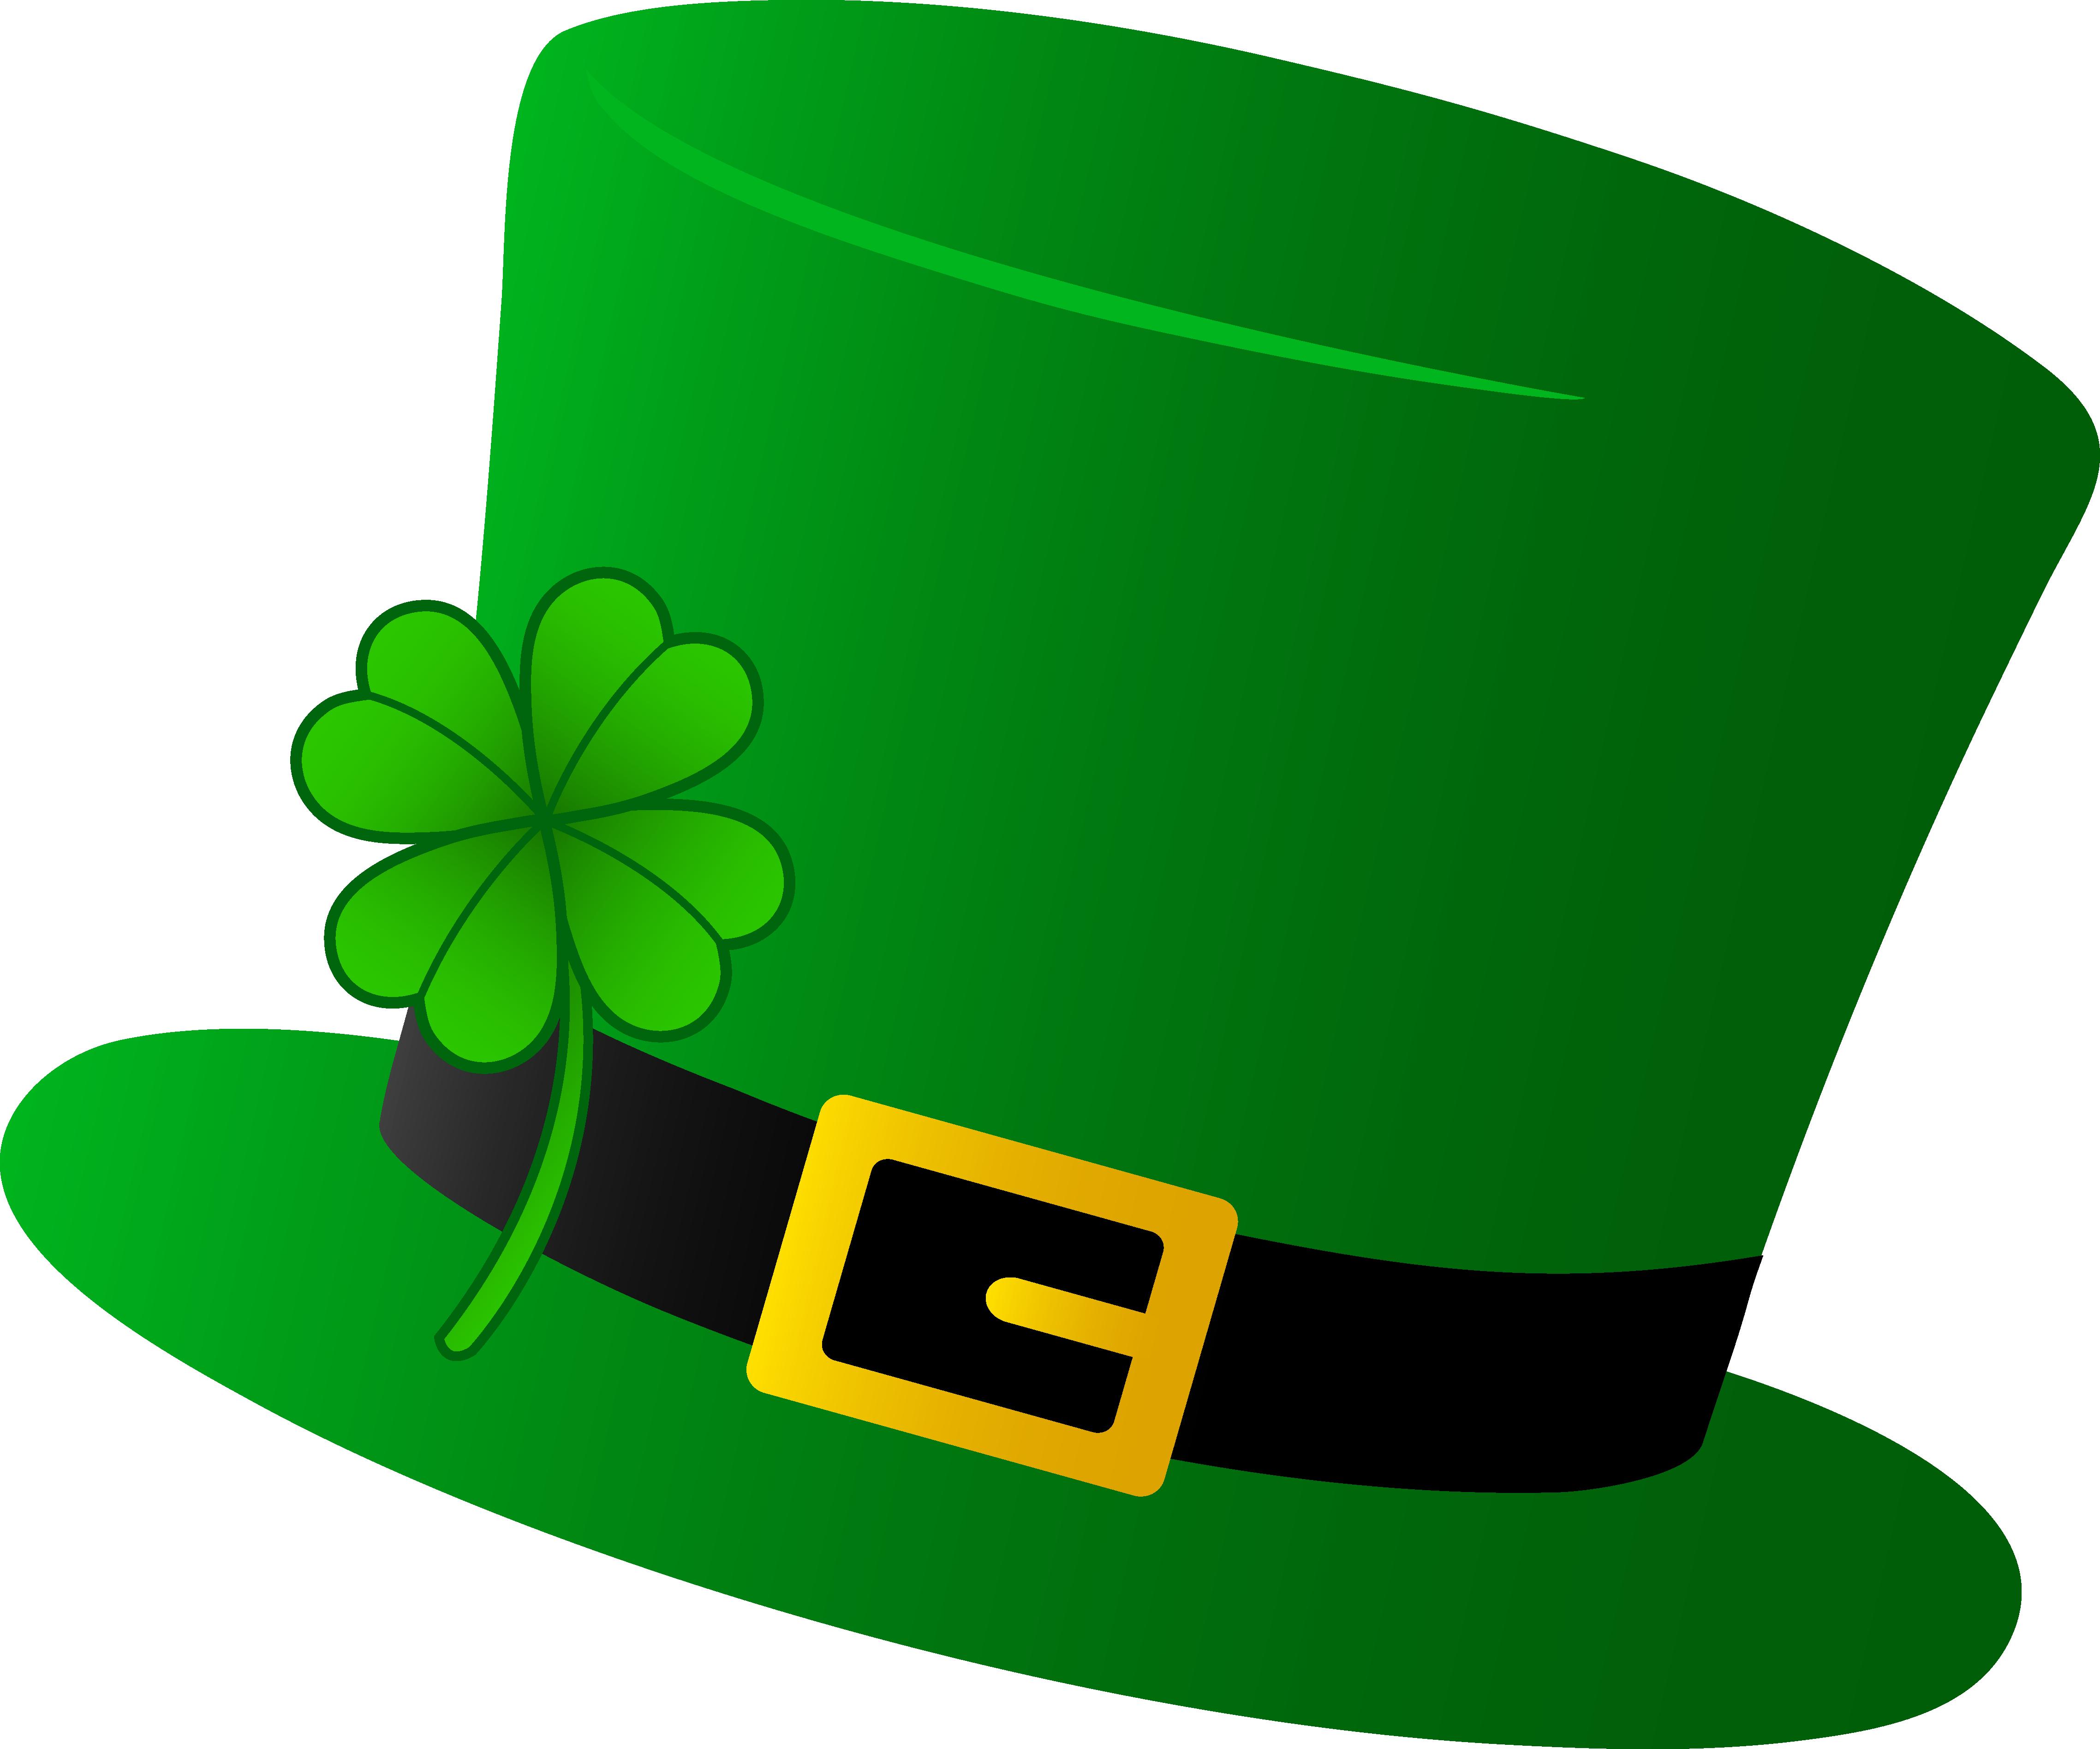 4552x3791 Green Saint Patricks Day Hat